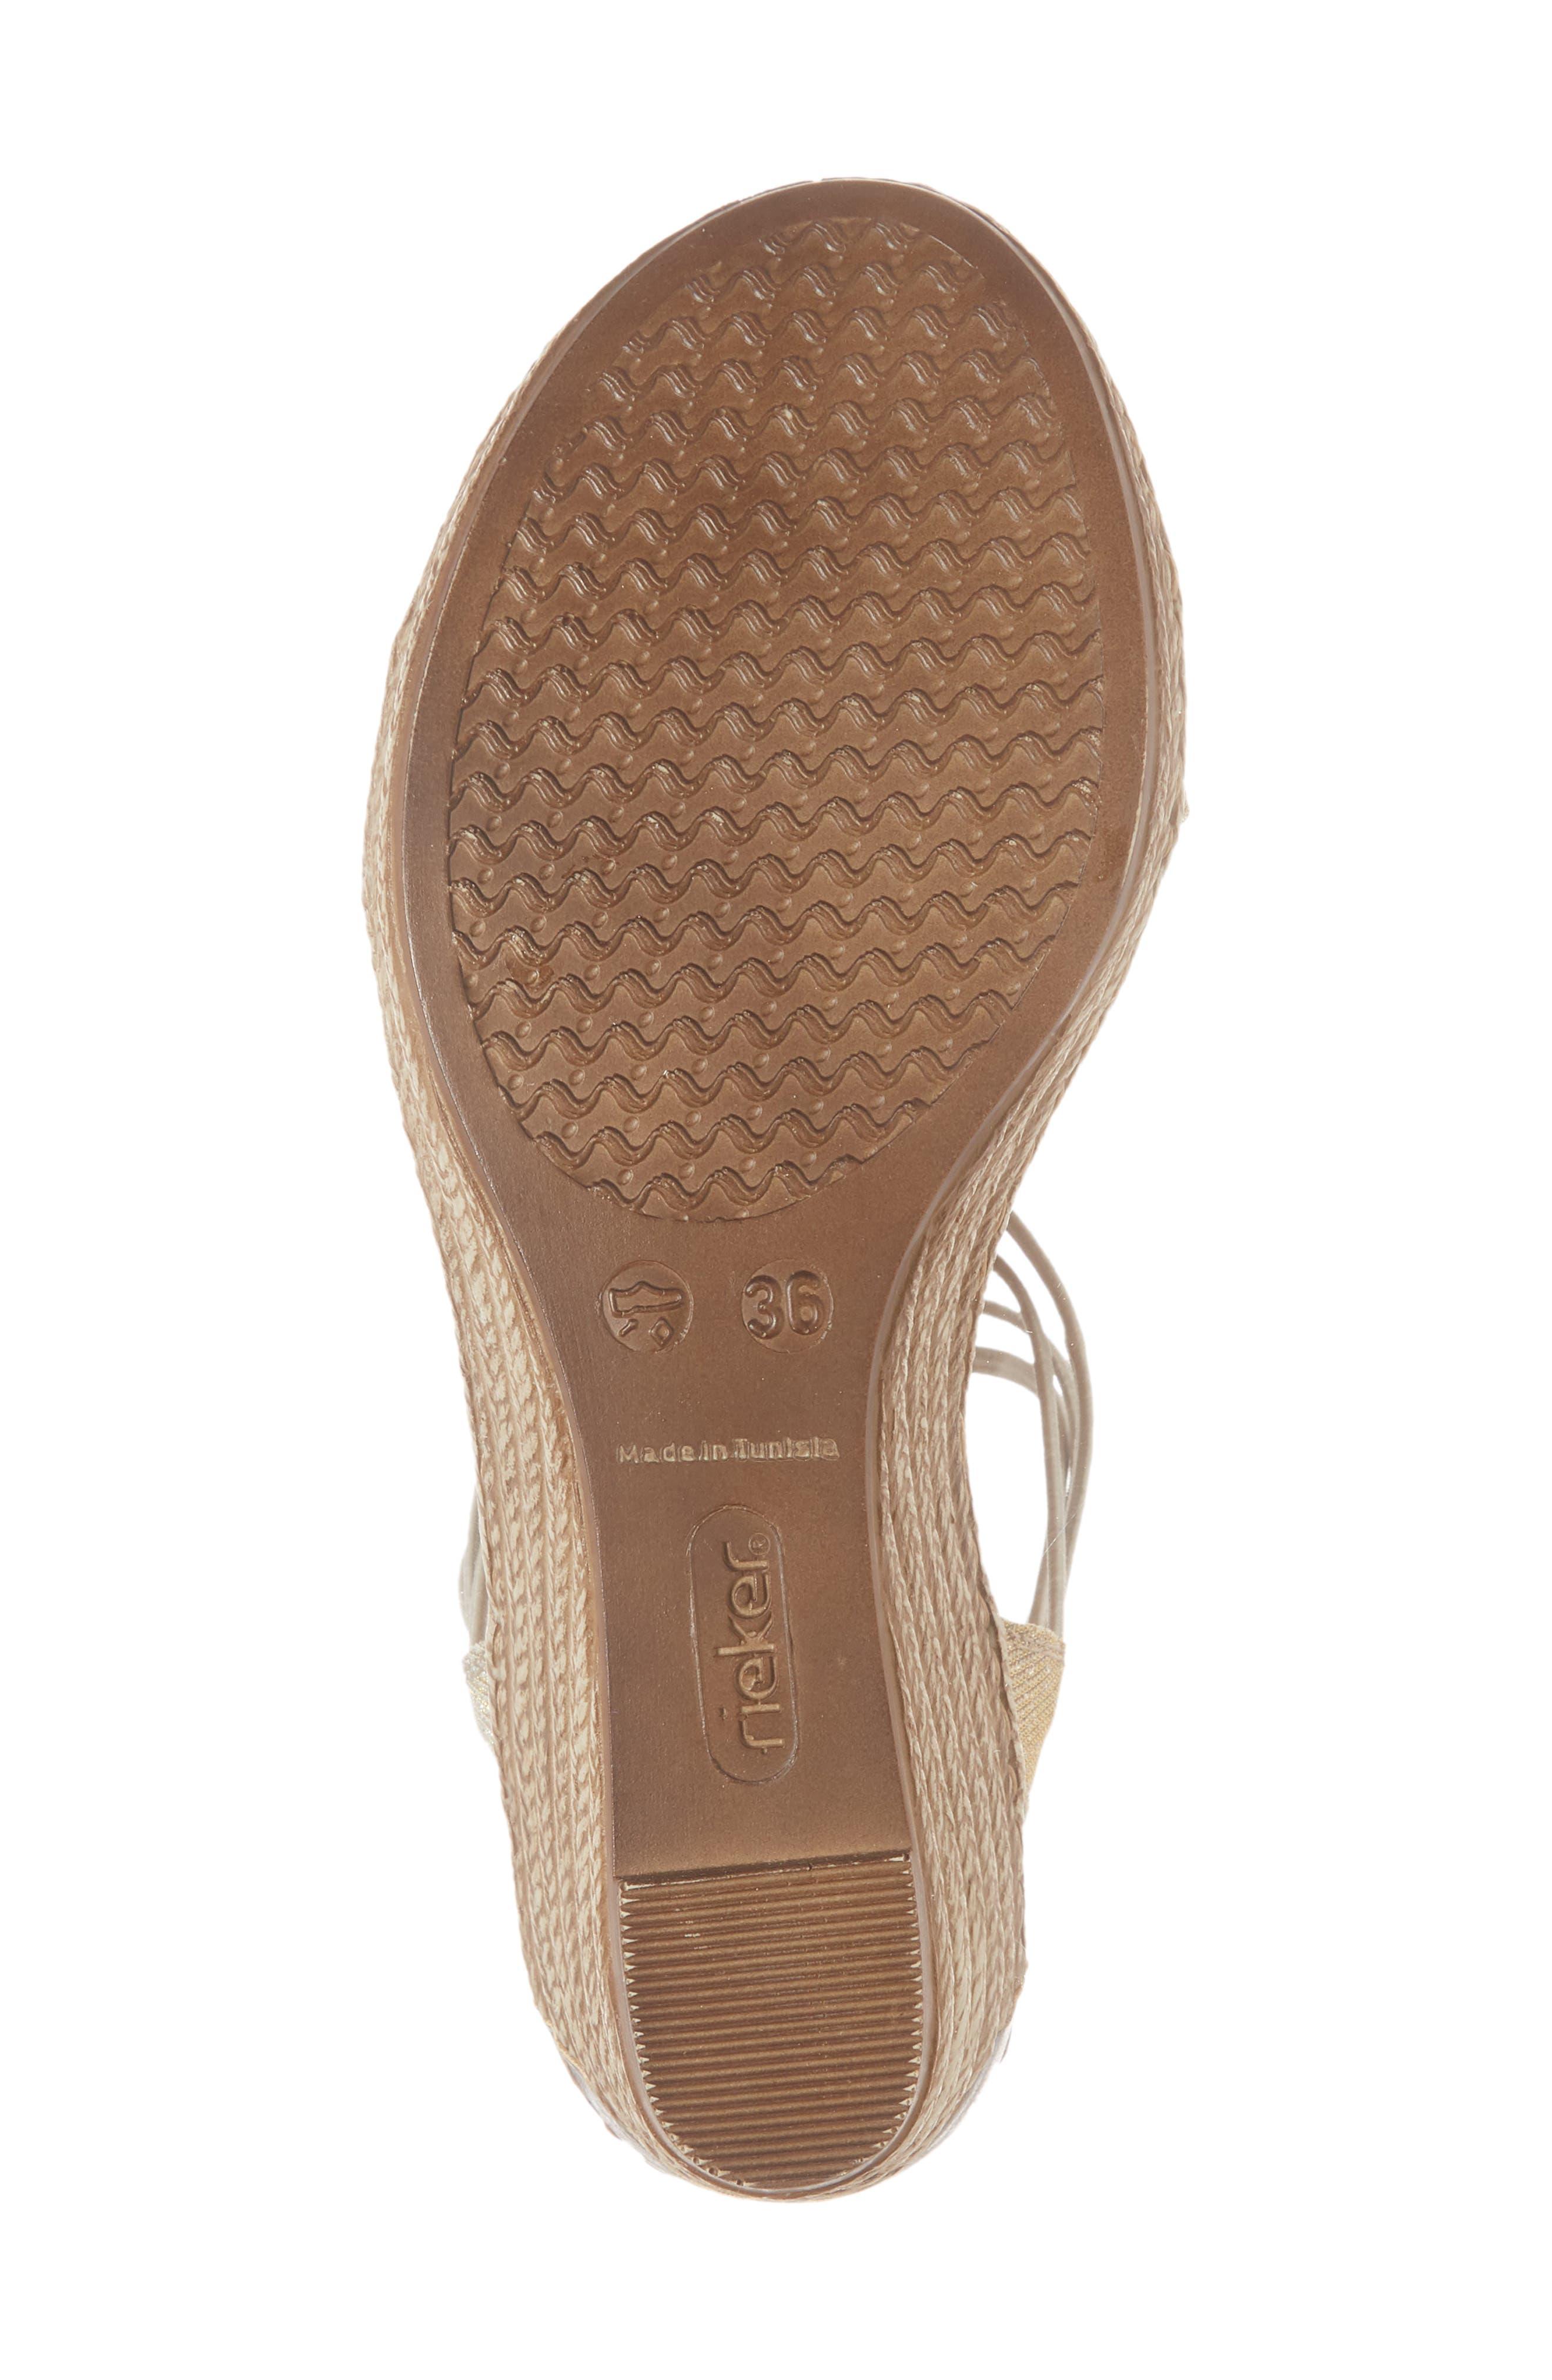 Fanni 22 Espadrille Wedge Sandal,                             Alternate thumbnail 6, color,                             Light Gold/ Grey Fabric